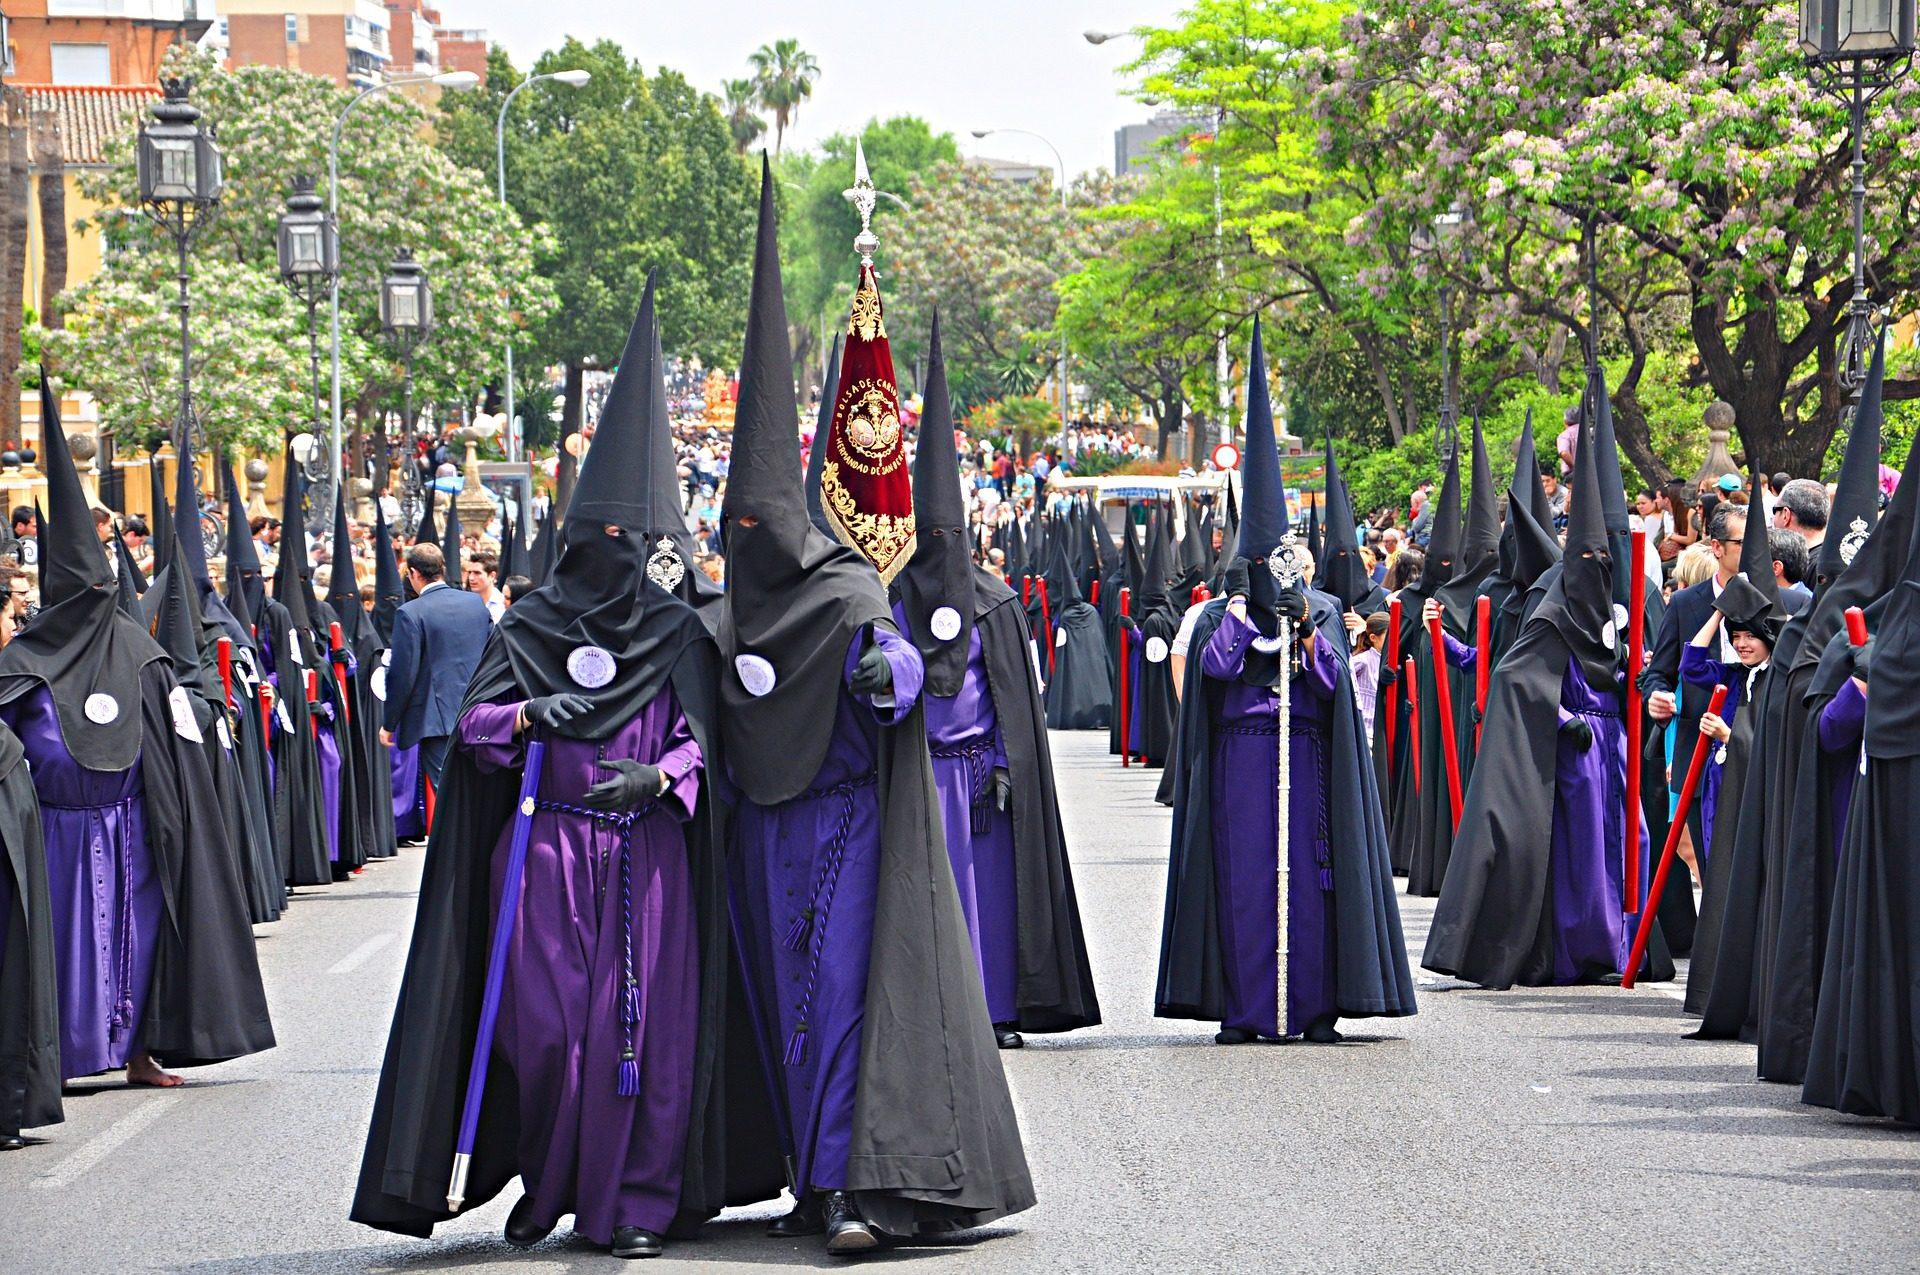 Ostern, Prozession, Bruderschaft, Nazarener, Das Christentum, Sevilla, Spanien - Wallpaper HD - Prof.-falken.com